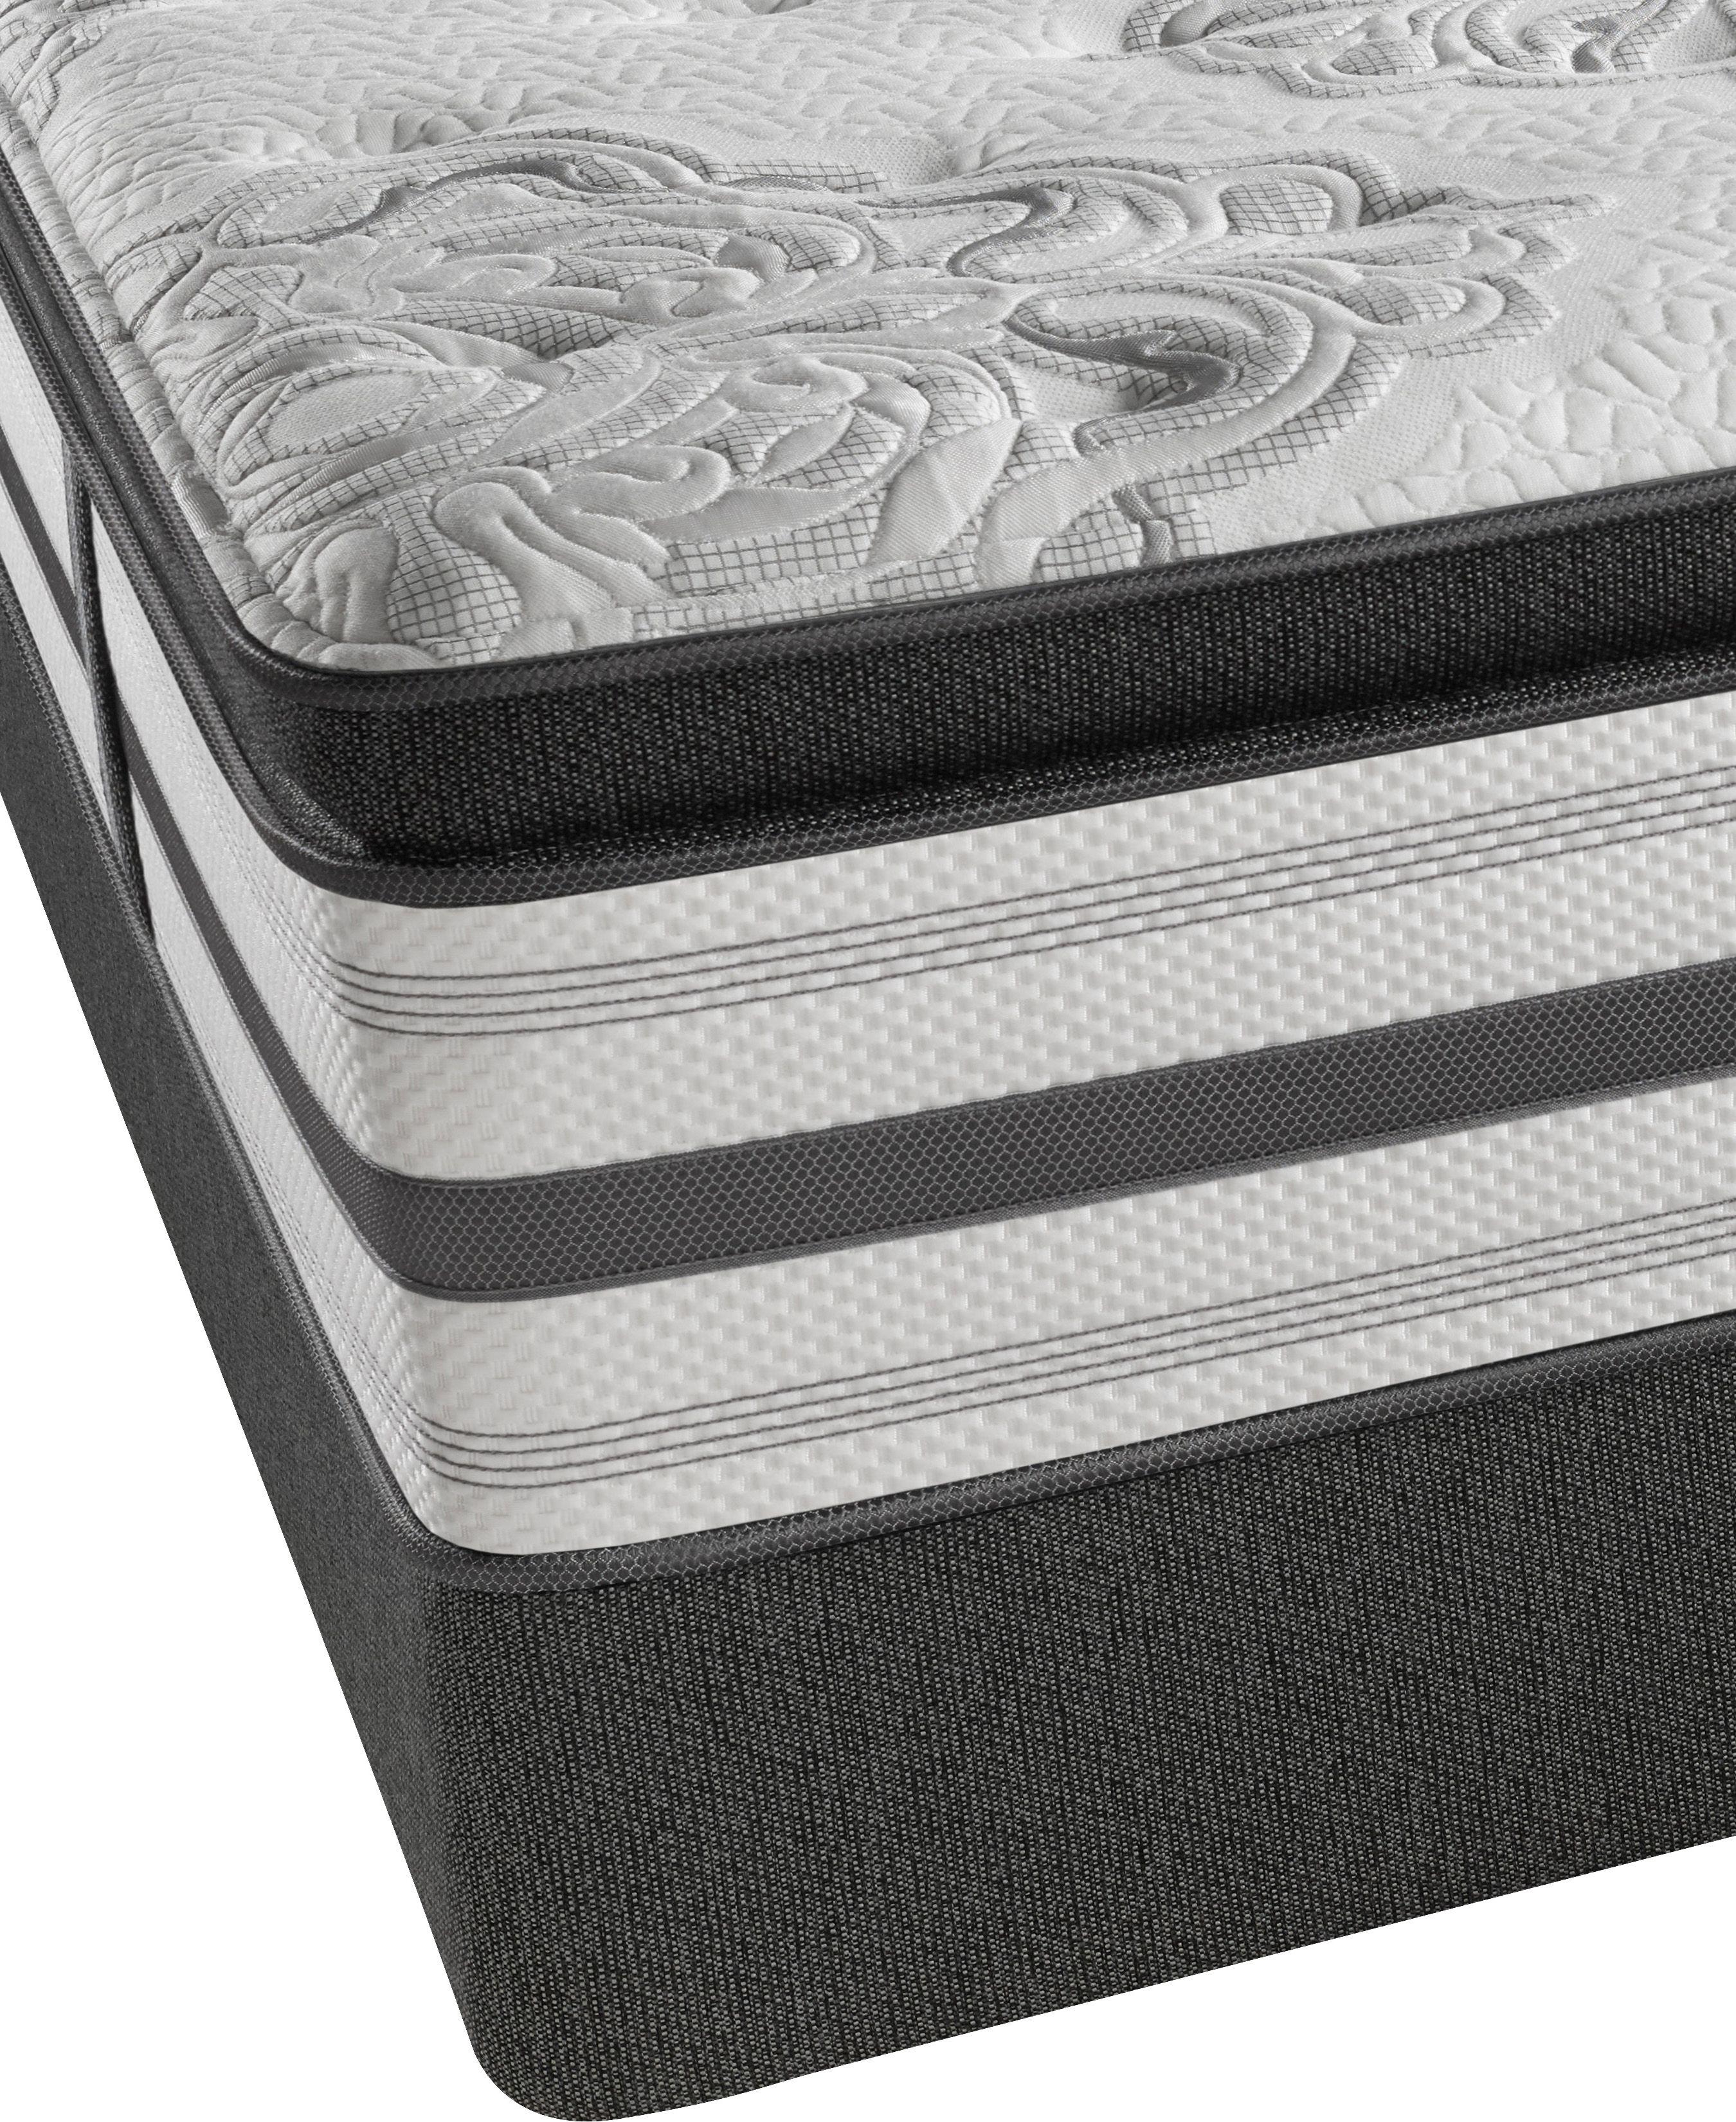 simmons beautyrest platinum stone mountain plush pillow top cal king